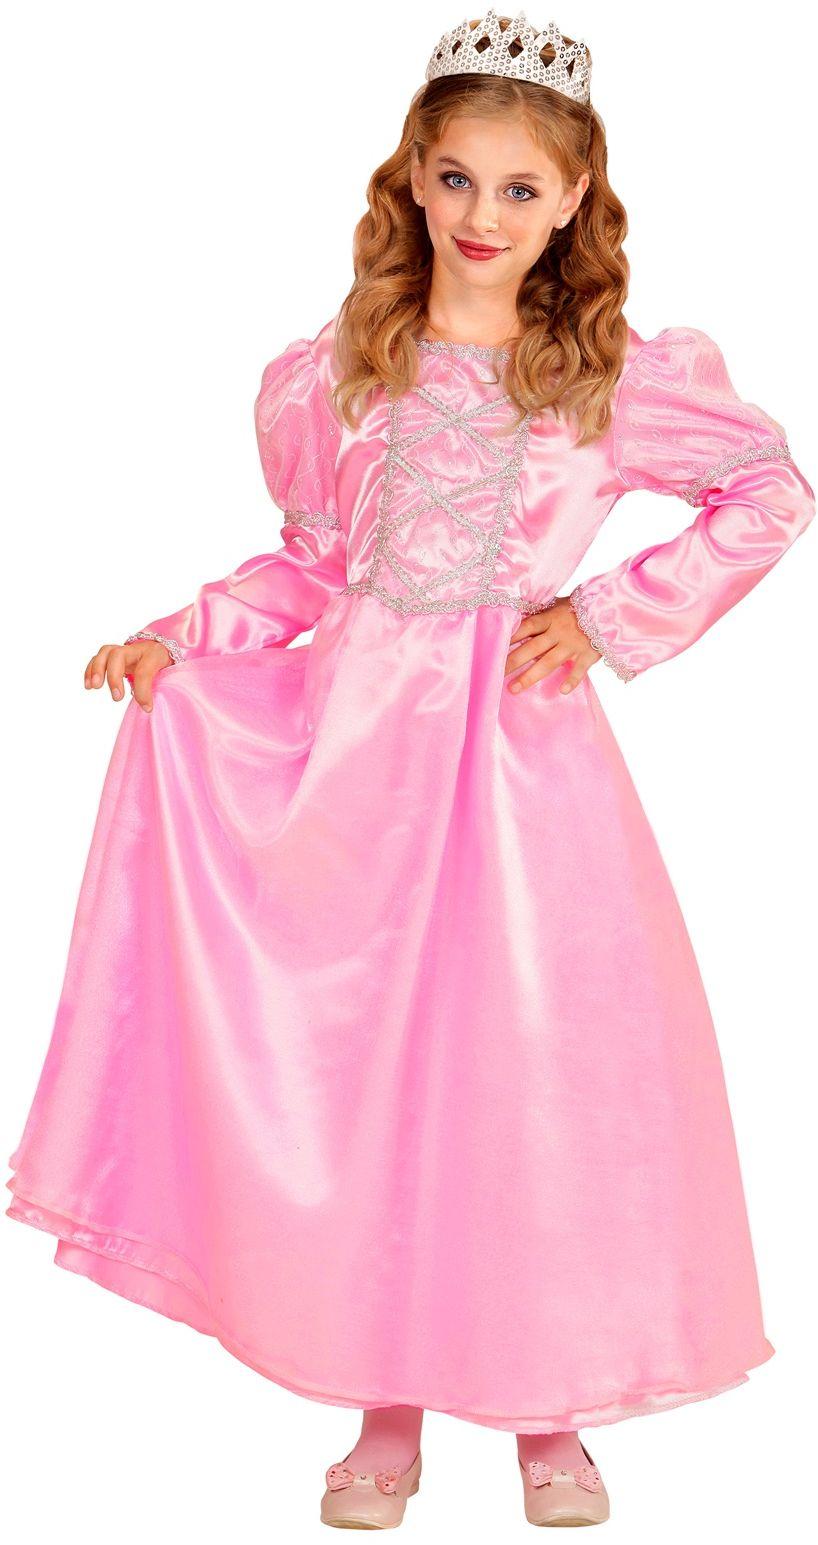 Roze prinsessen jurk kind